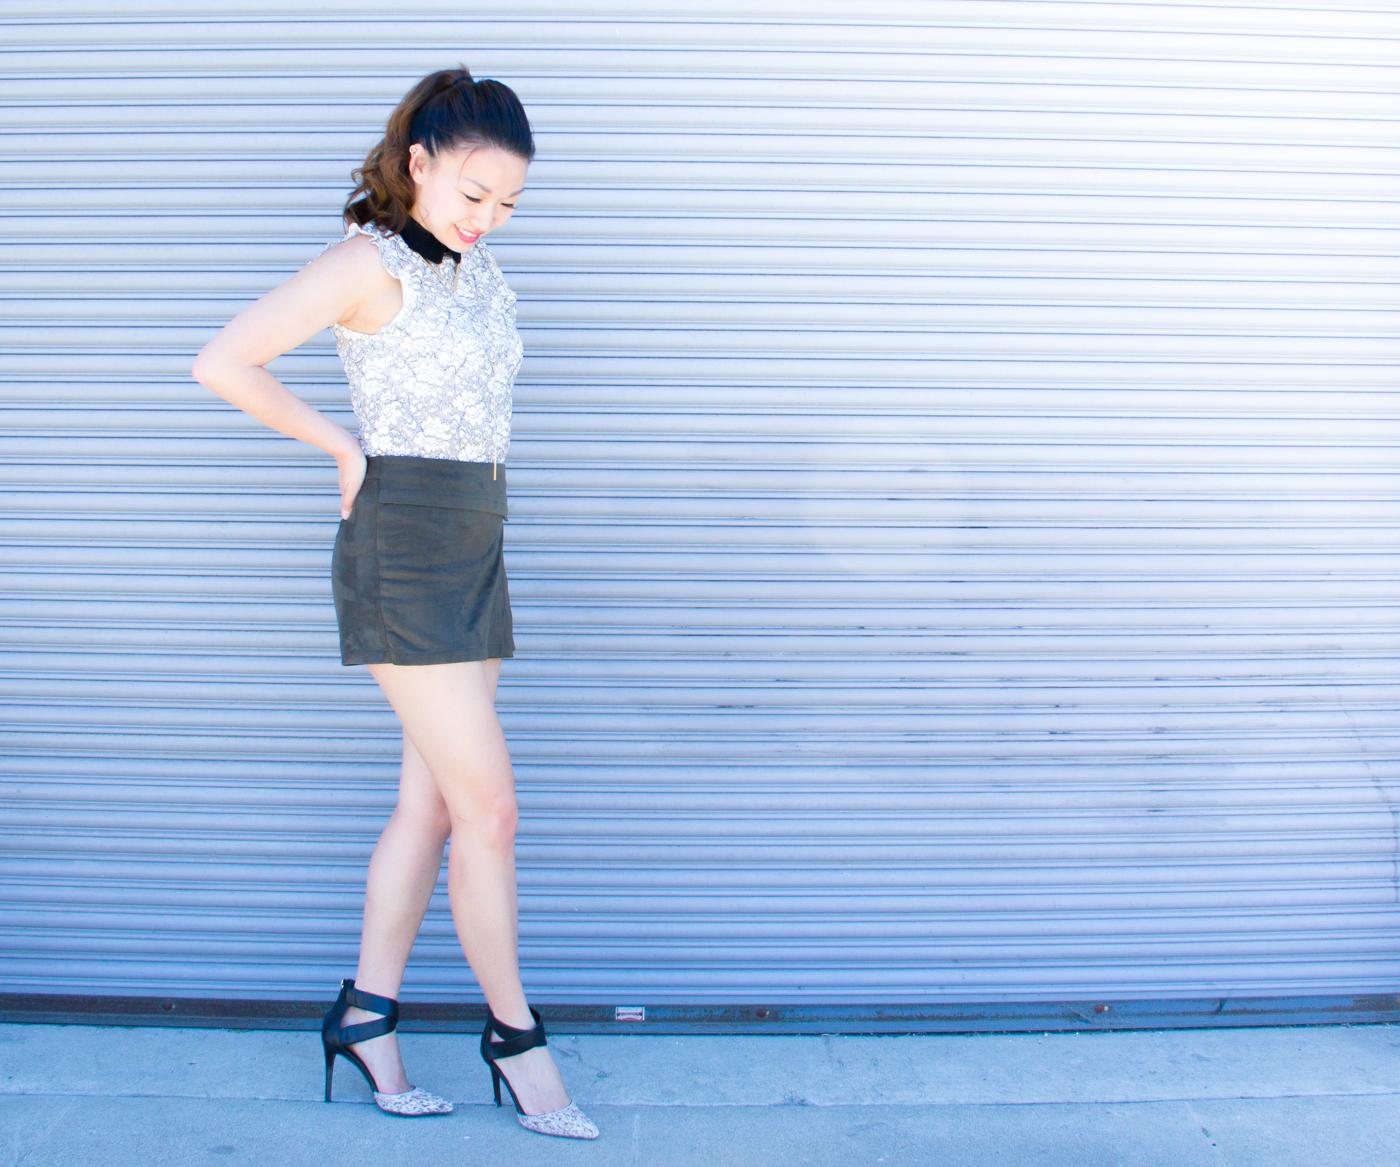 Street style | via The Chic Diary